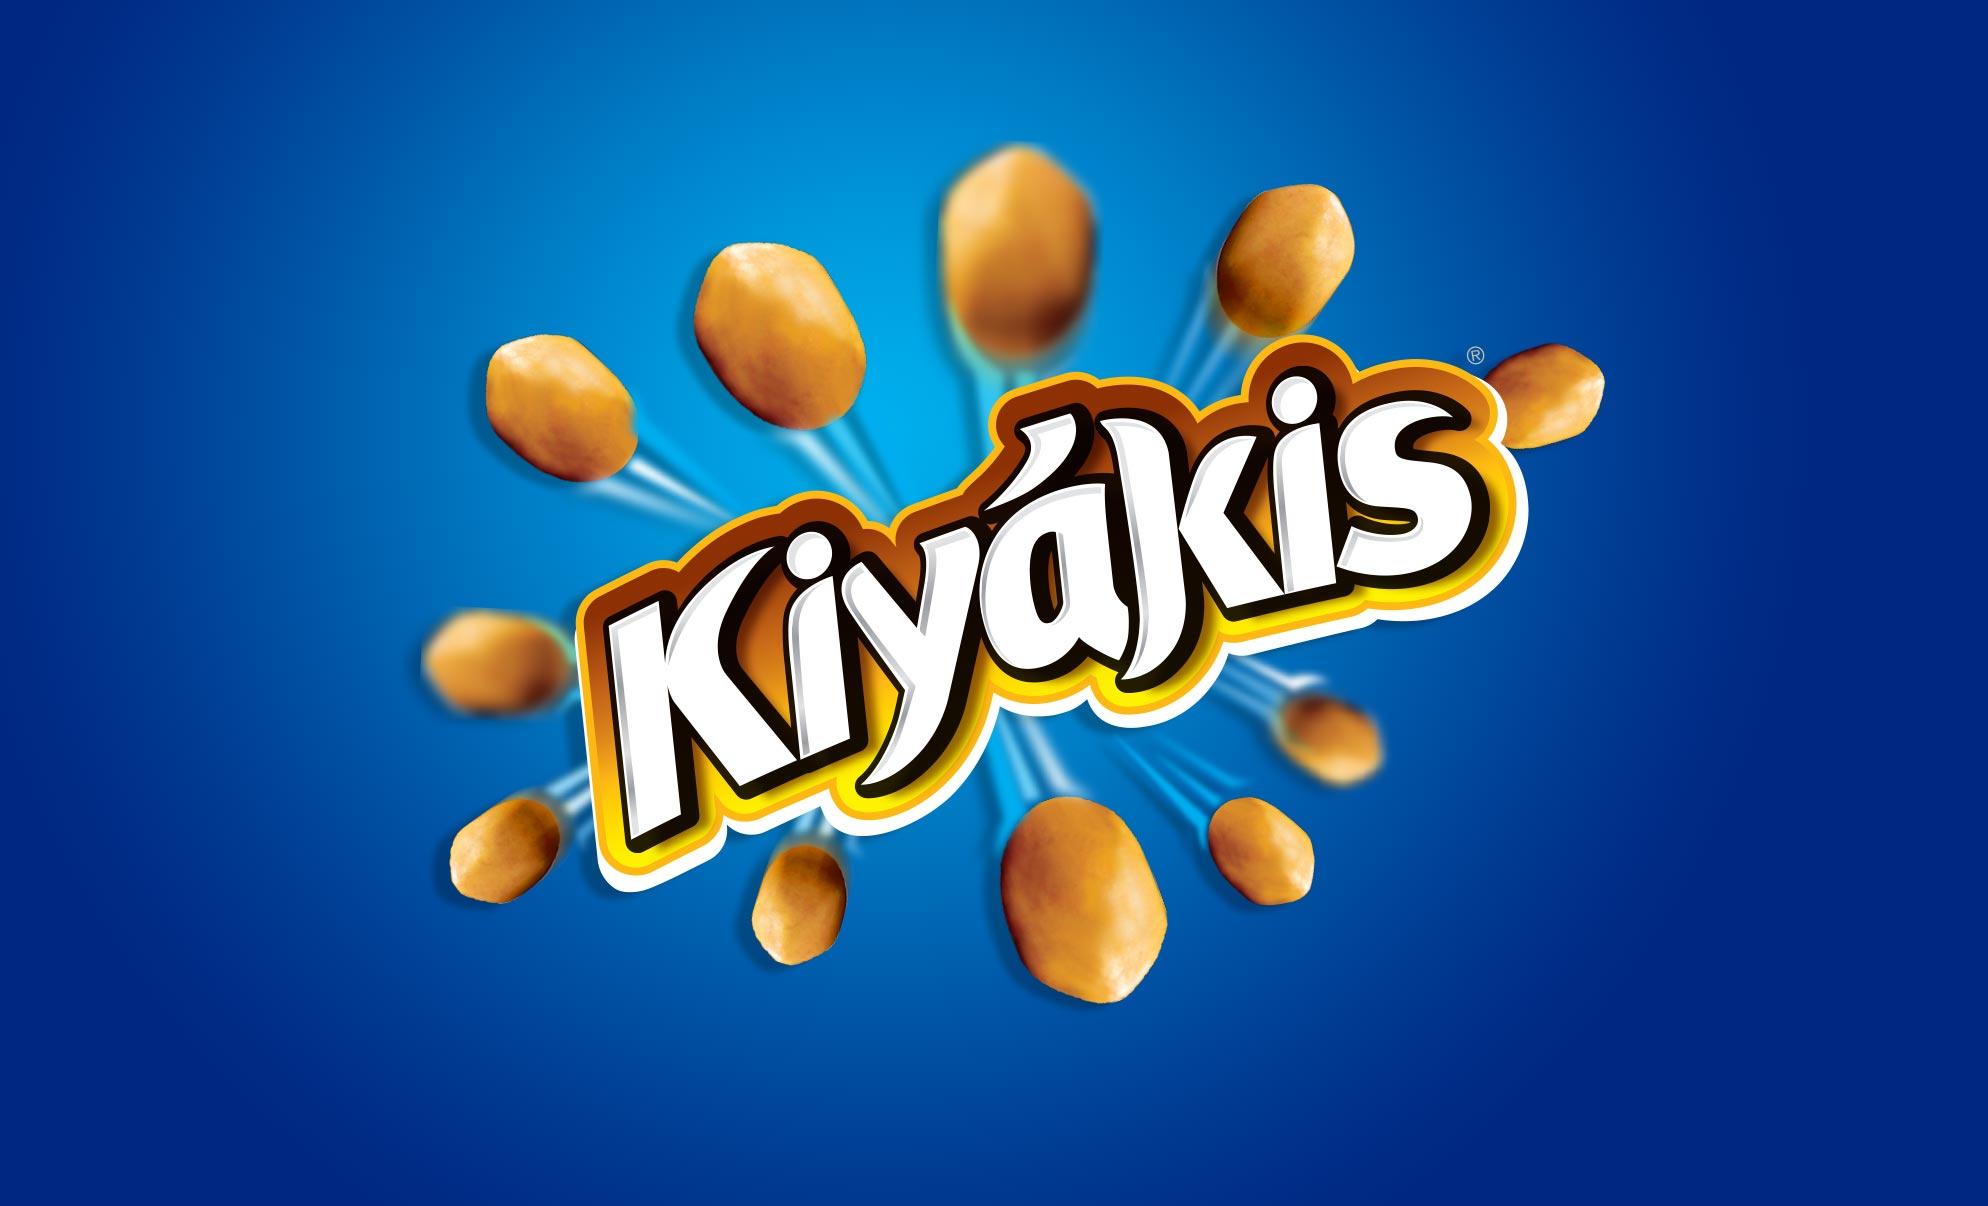 Kiyakis Peanuts Logotype Logo